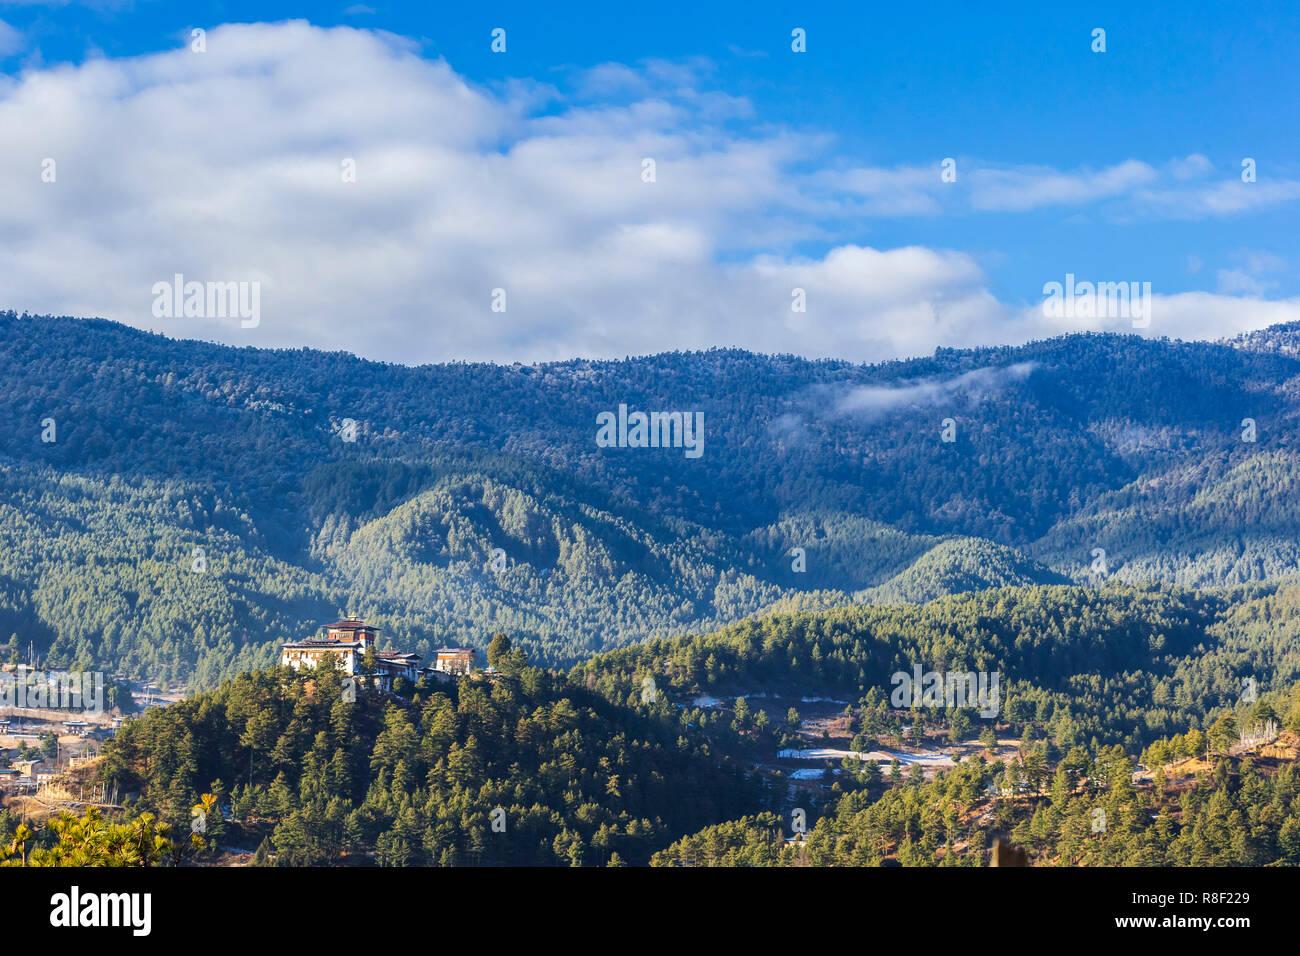 Bumthang Dzong monastery in the Kingdom of Bhutan. - Stock Image